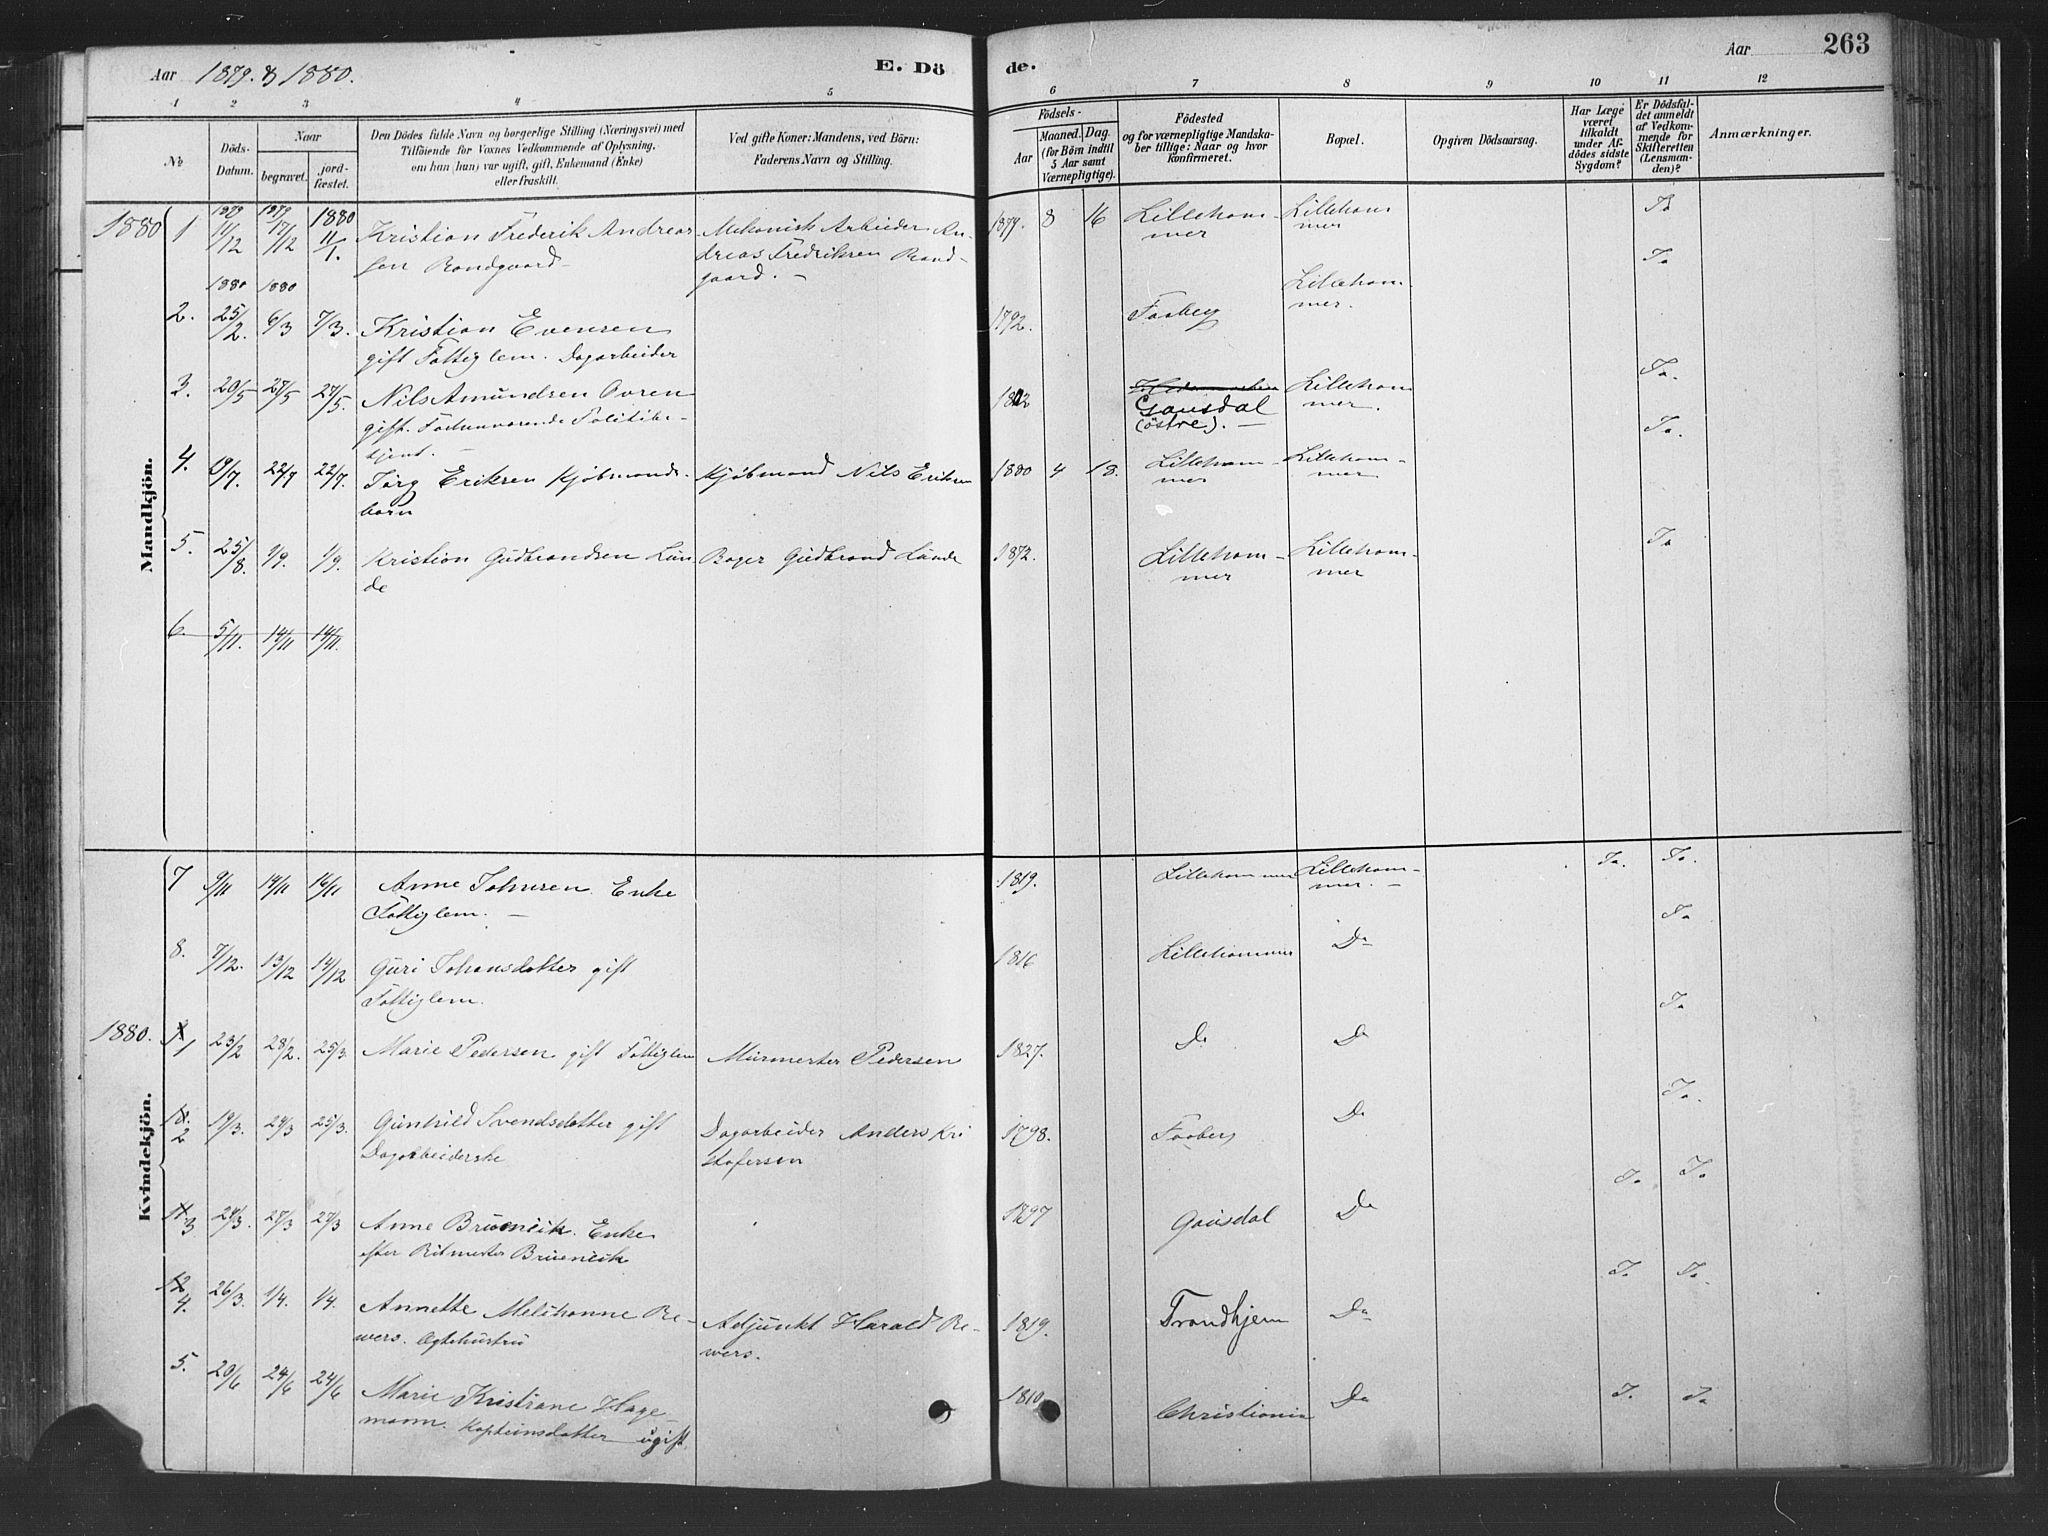 SAH, Fåberg prestekontor, Ministerialbok nr. 10, 1879-1900, s. 263